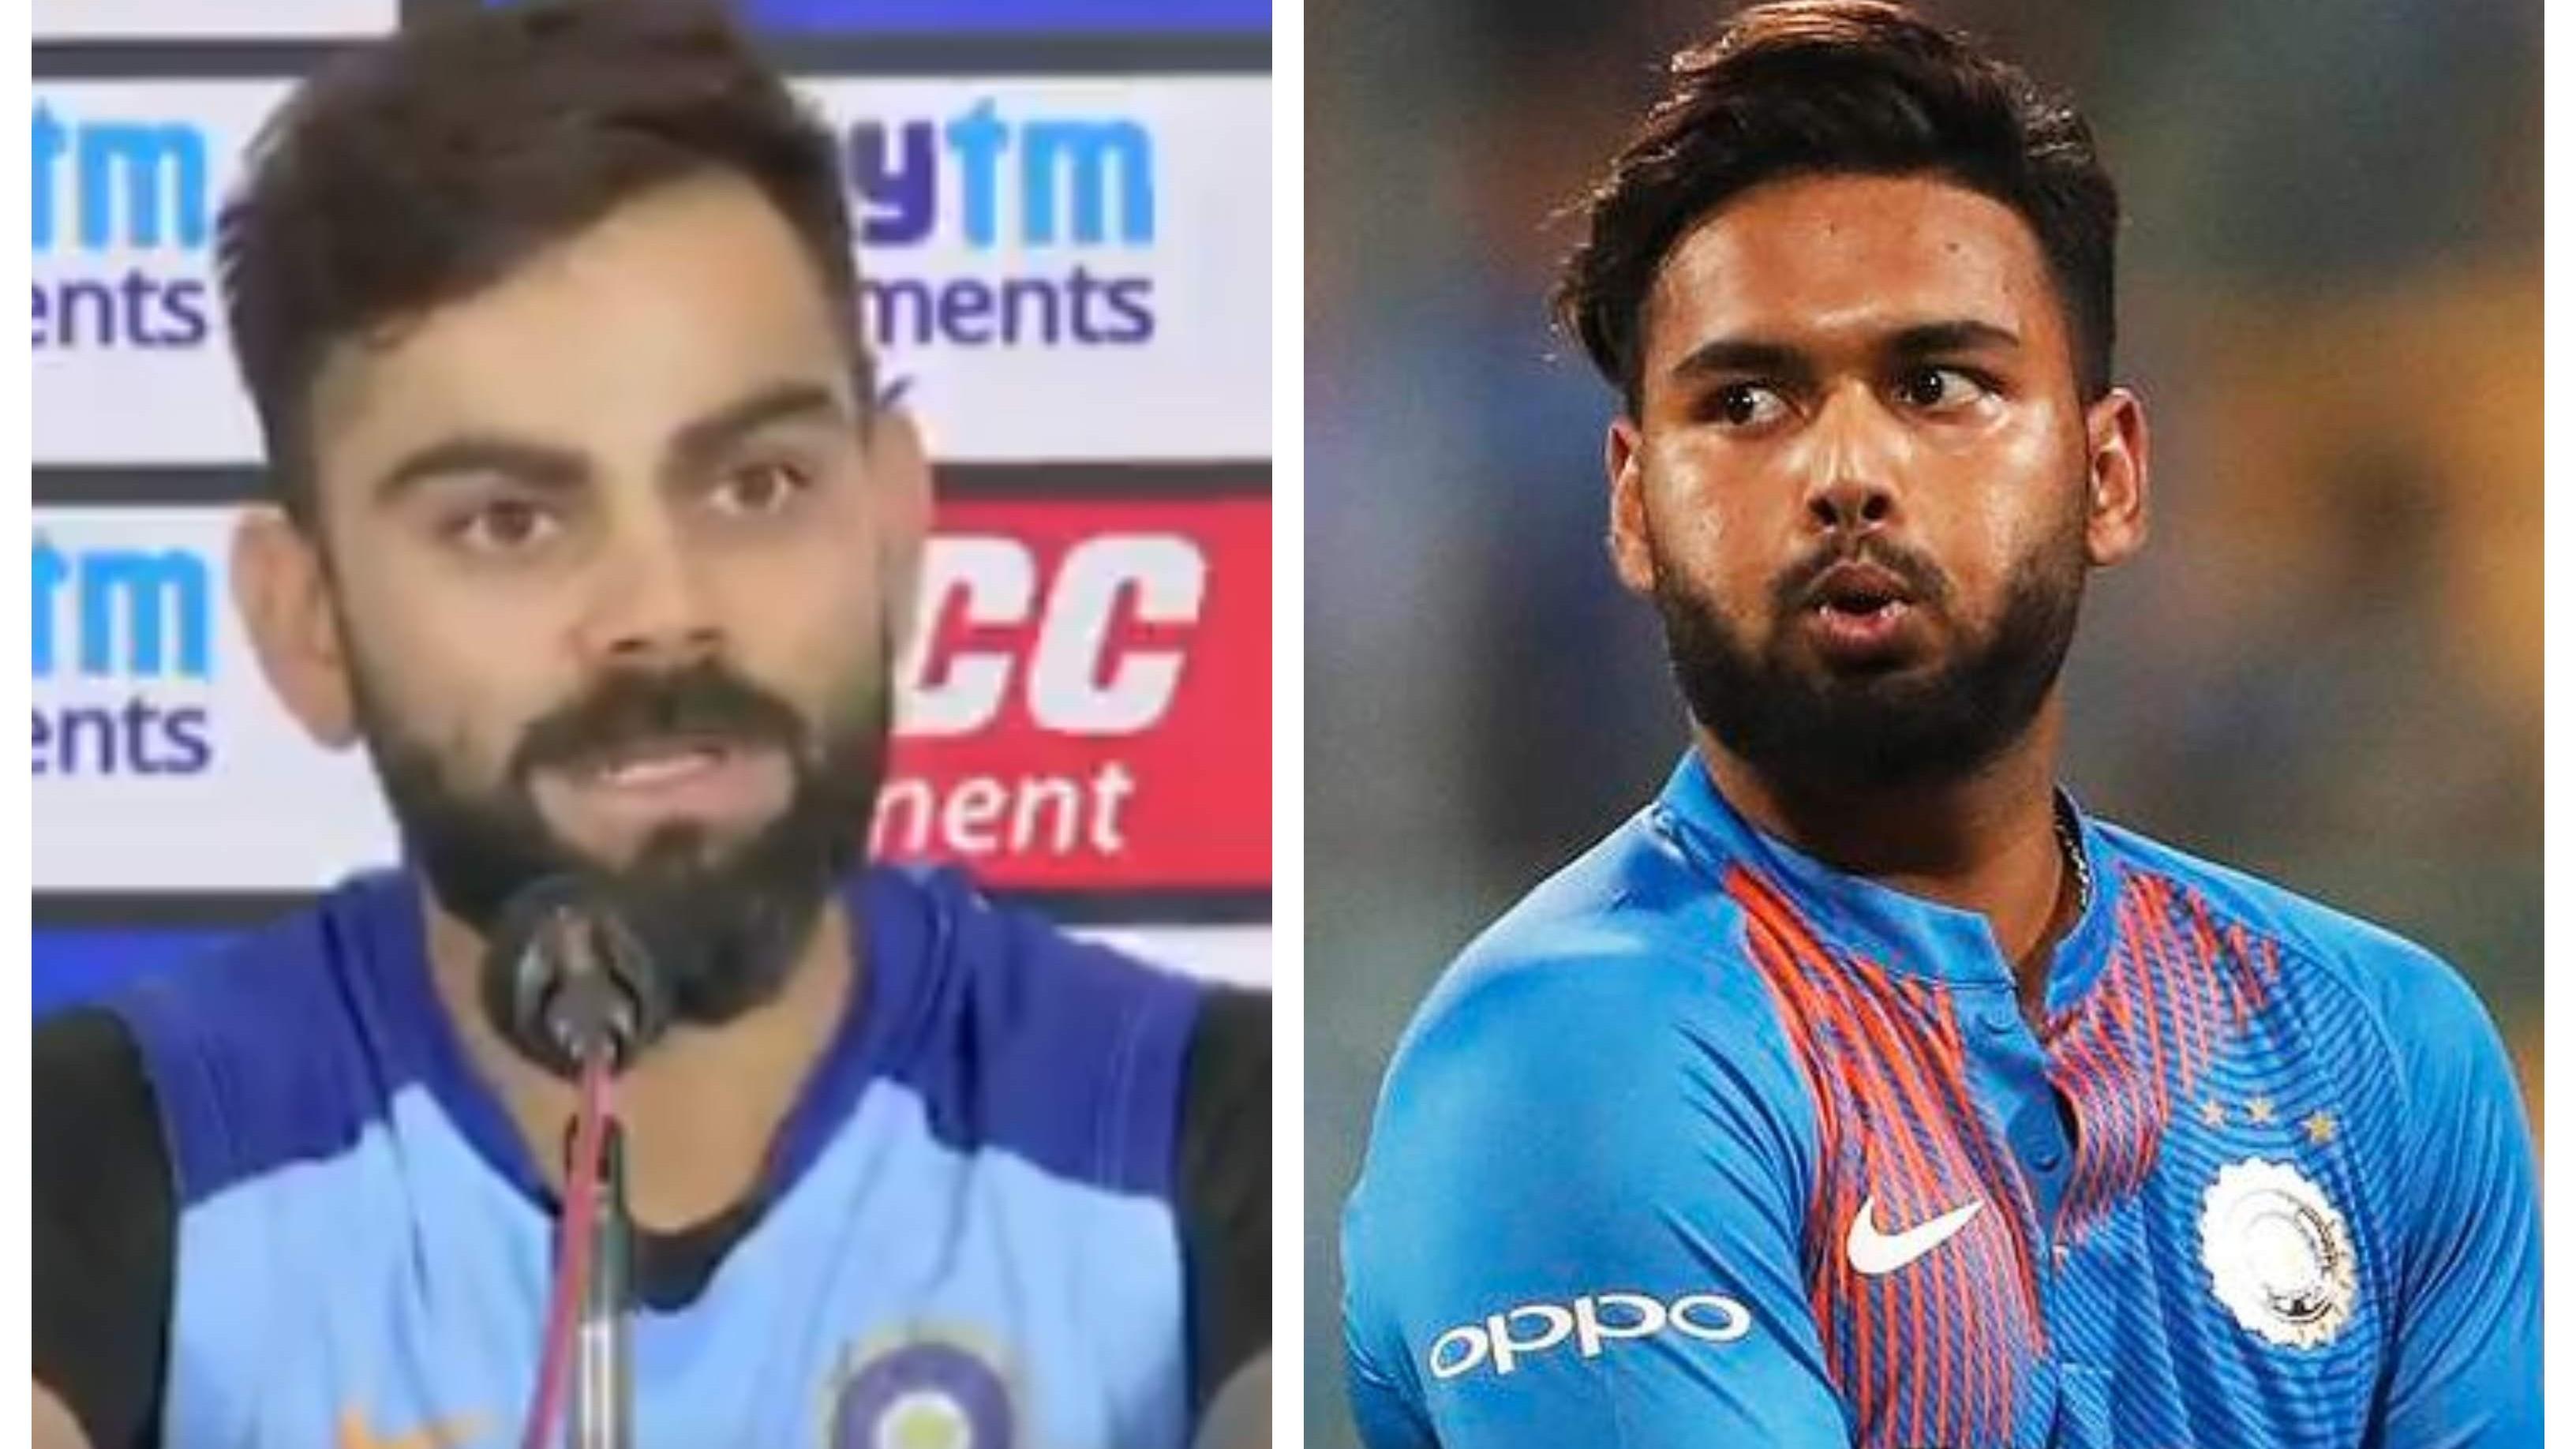 "IND v WI 2019: WATCH – ""Rishabh Pant needs to be left alone,"" says Virat Kohli ahead of 1st T20I"